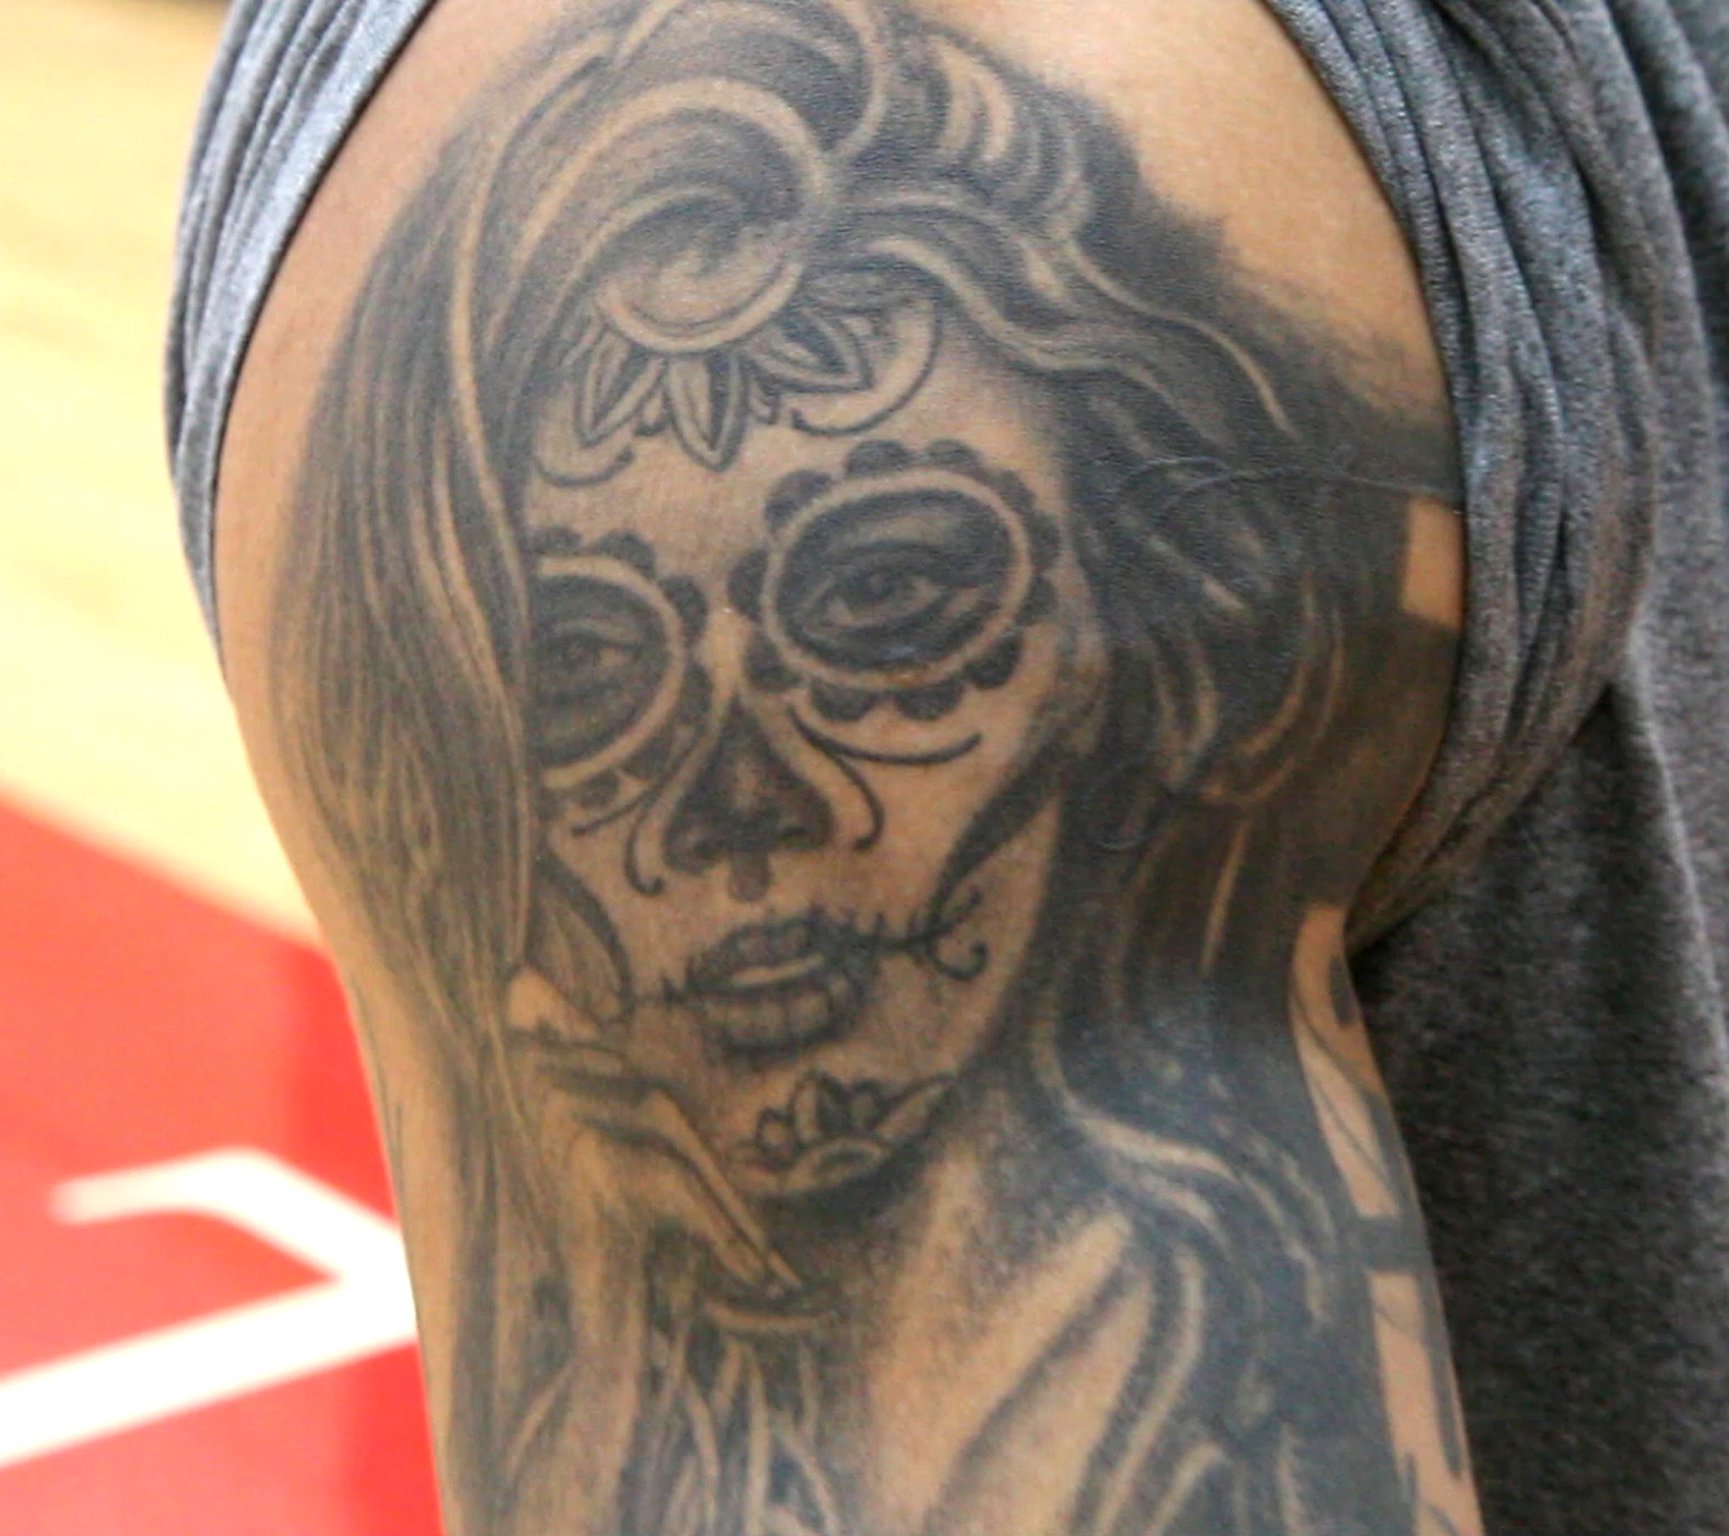 Dayton Flyers Tattoos Tell The Story Of Senior Kyle Davis